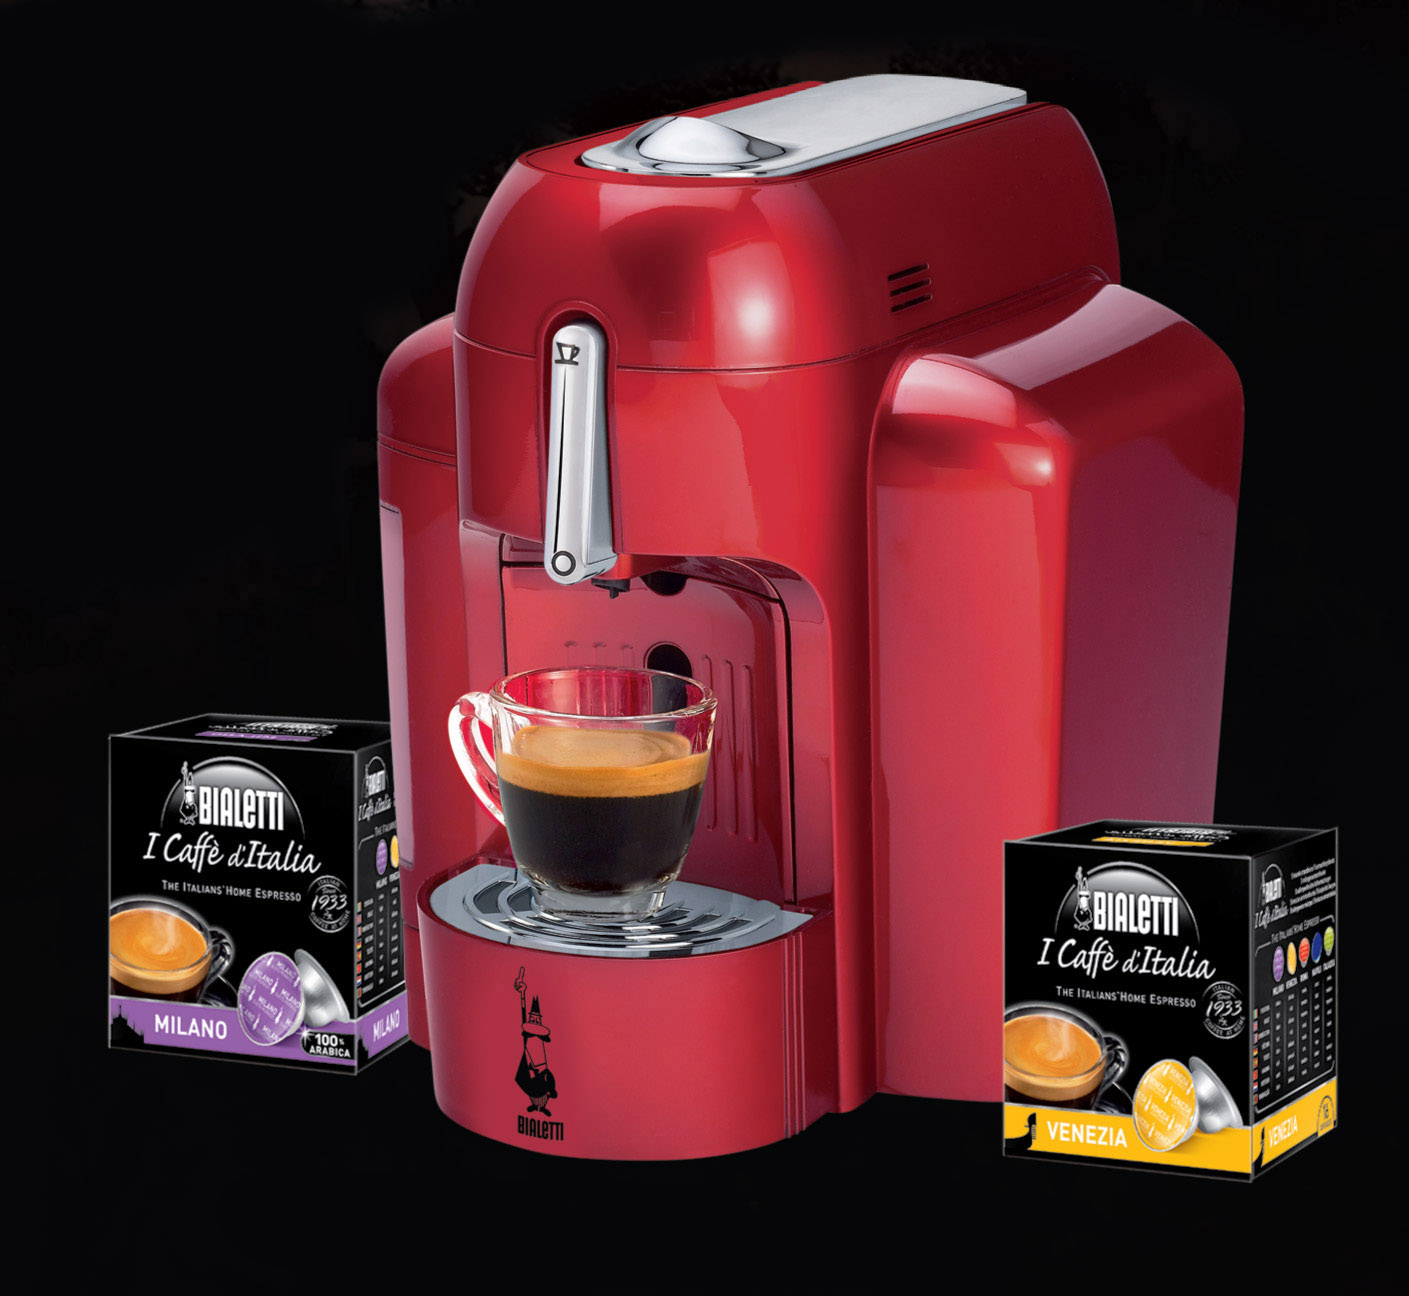 Bialetti S New Electric Single Serve Espresso System